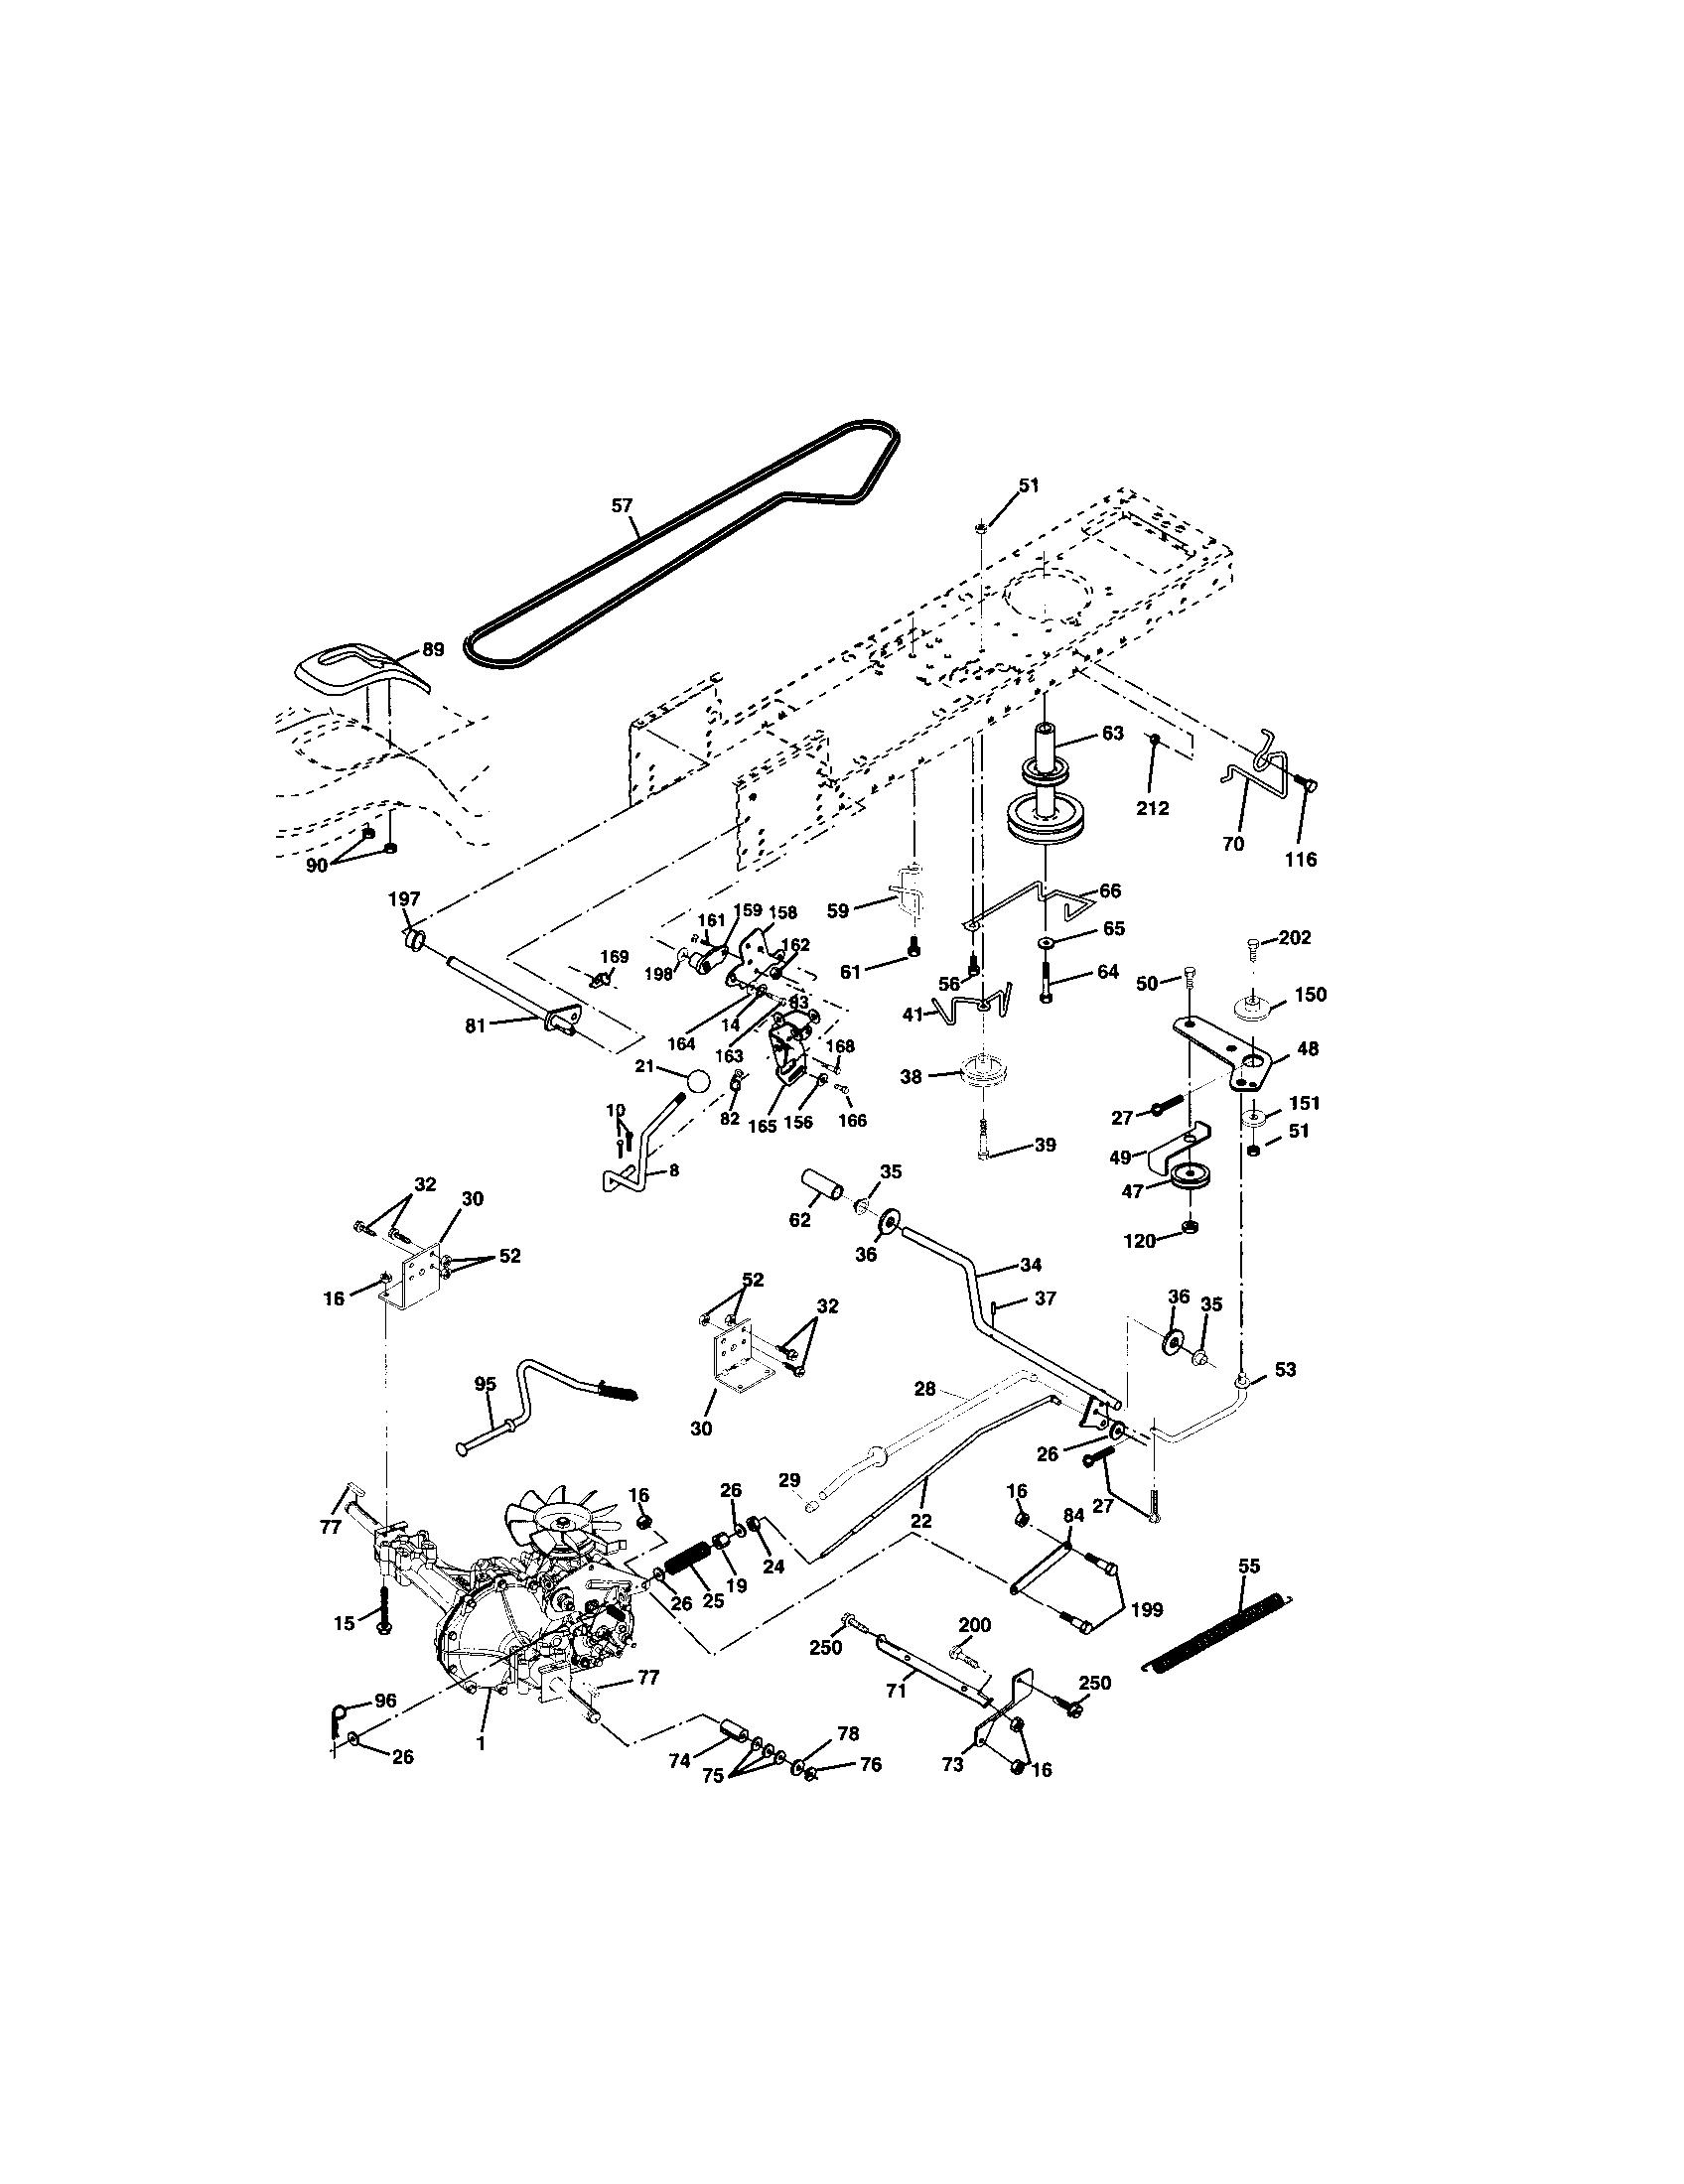 DL_8871] Wiring Diagram 917273160 Craftsman Tractor Download Diagram